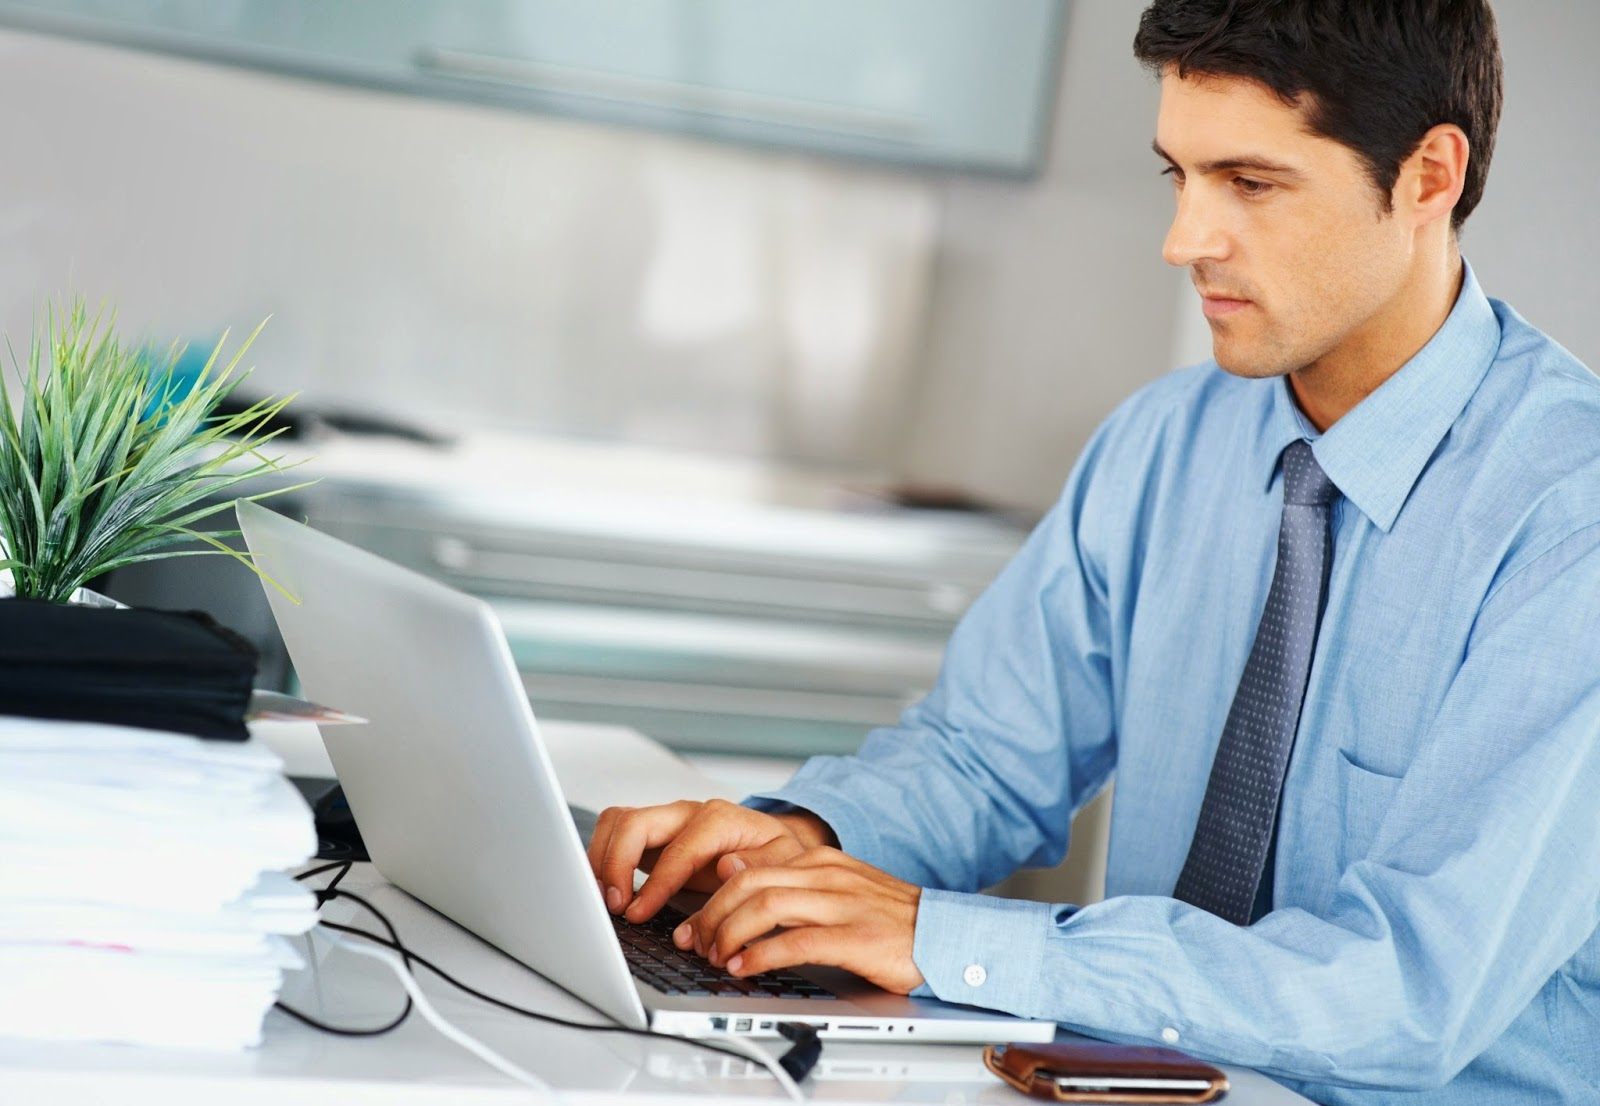 lợi ích học trực tuyến 360